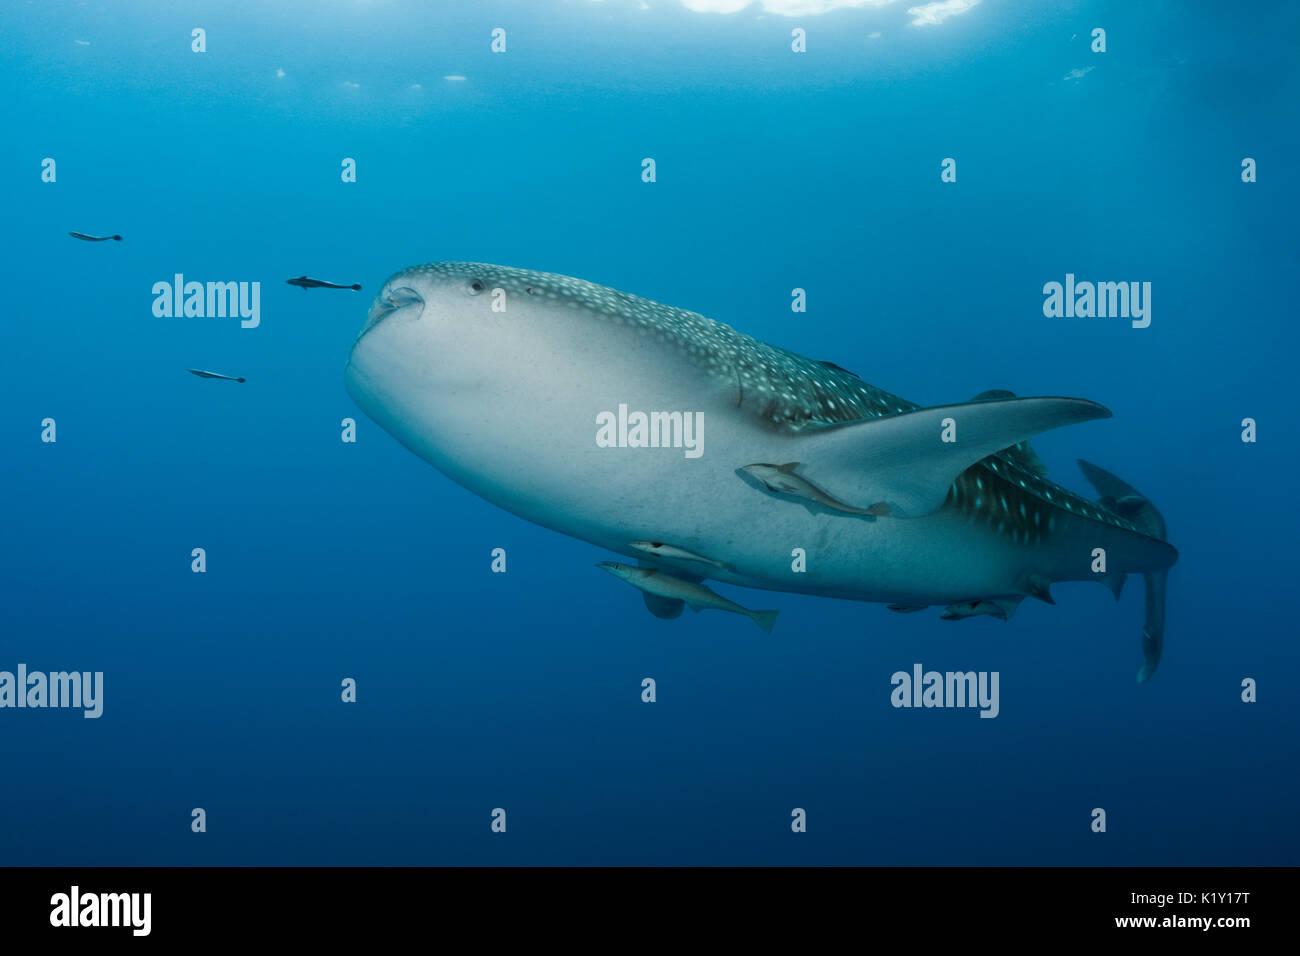 Whale Shark, Rhincodon typus, Christmas Island, Australia - Stock Image